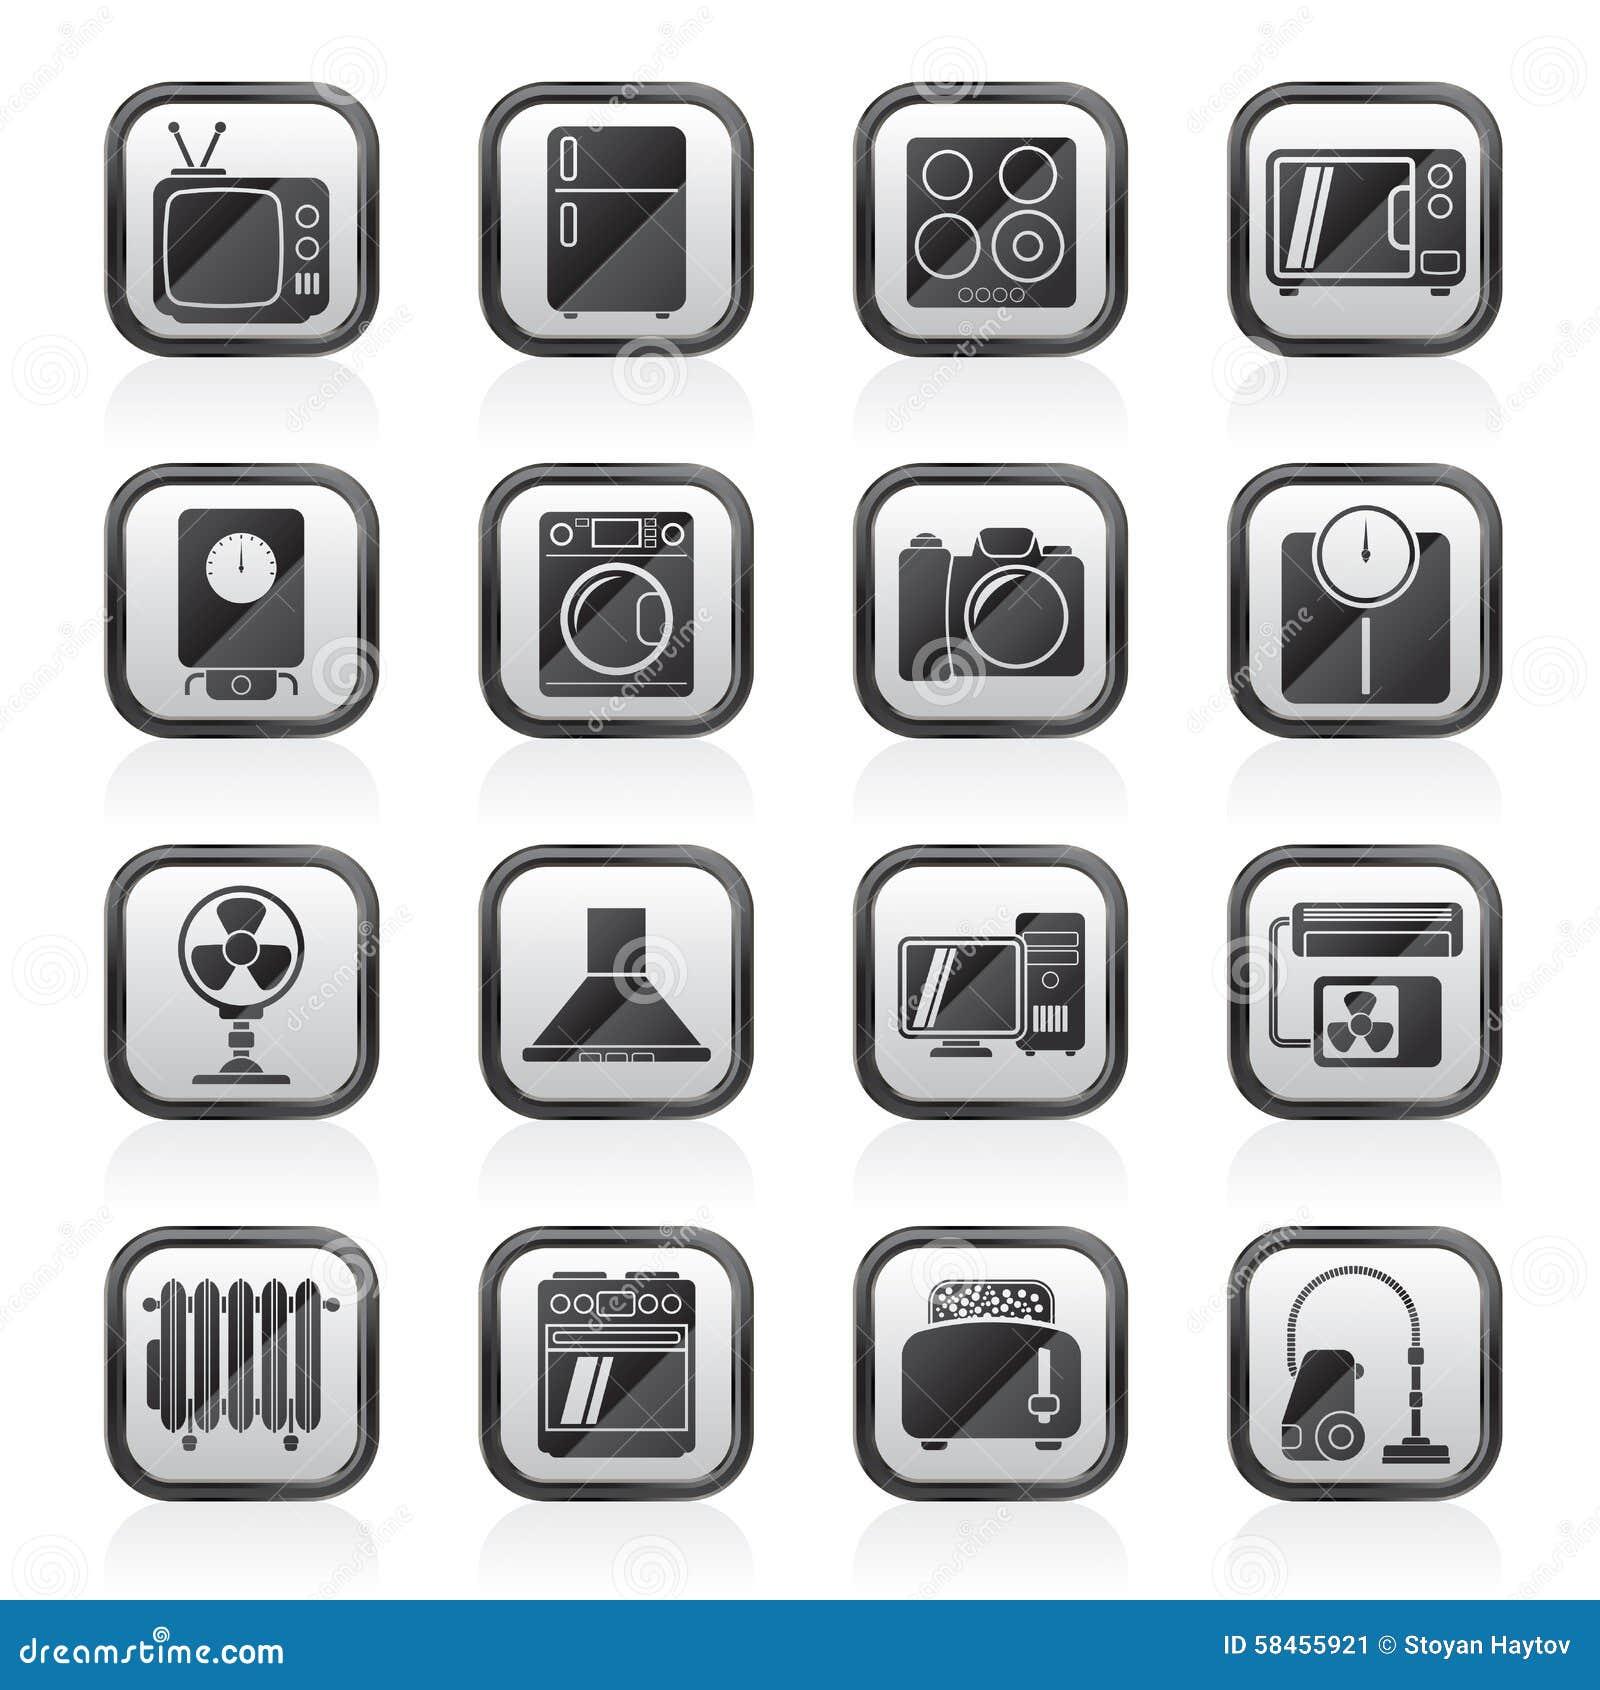 Home icon vector black